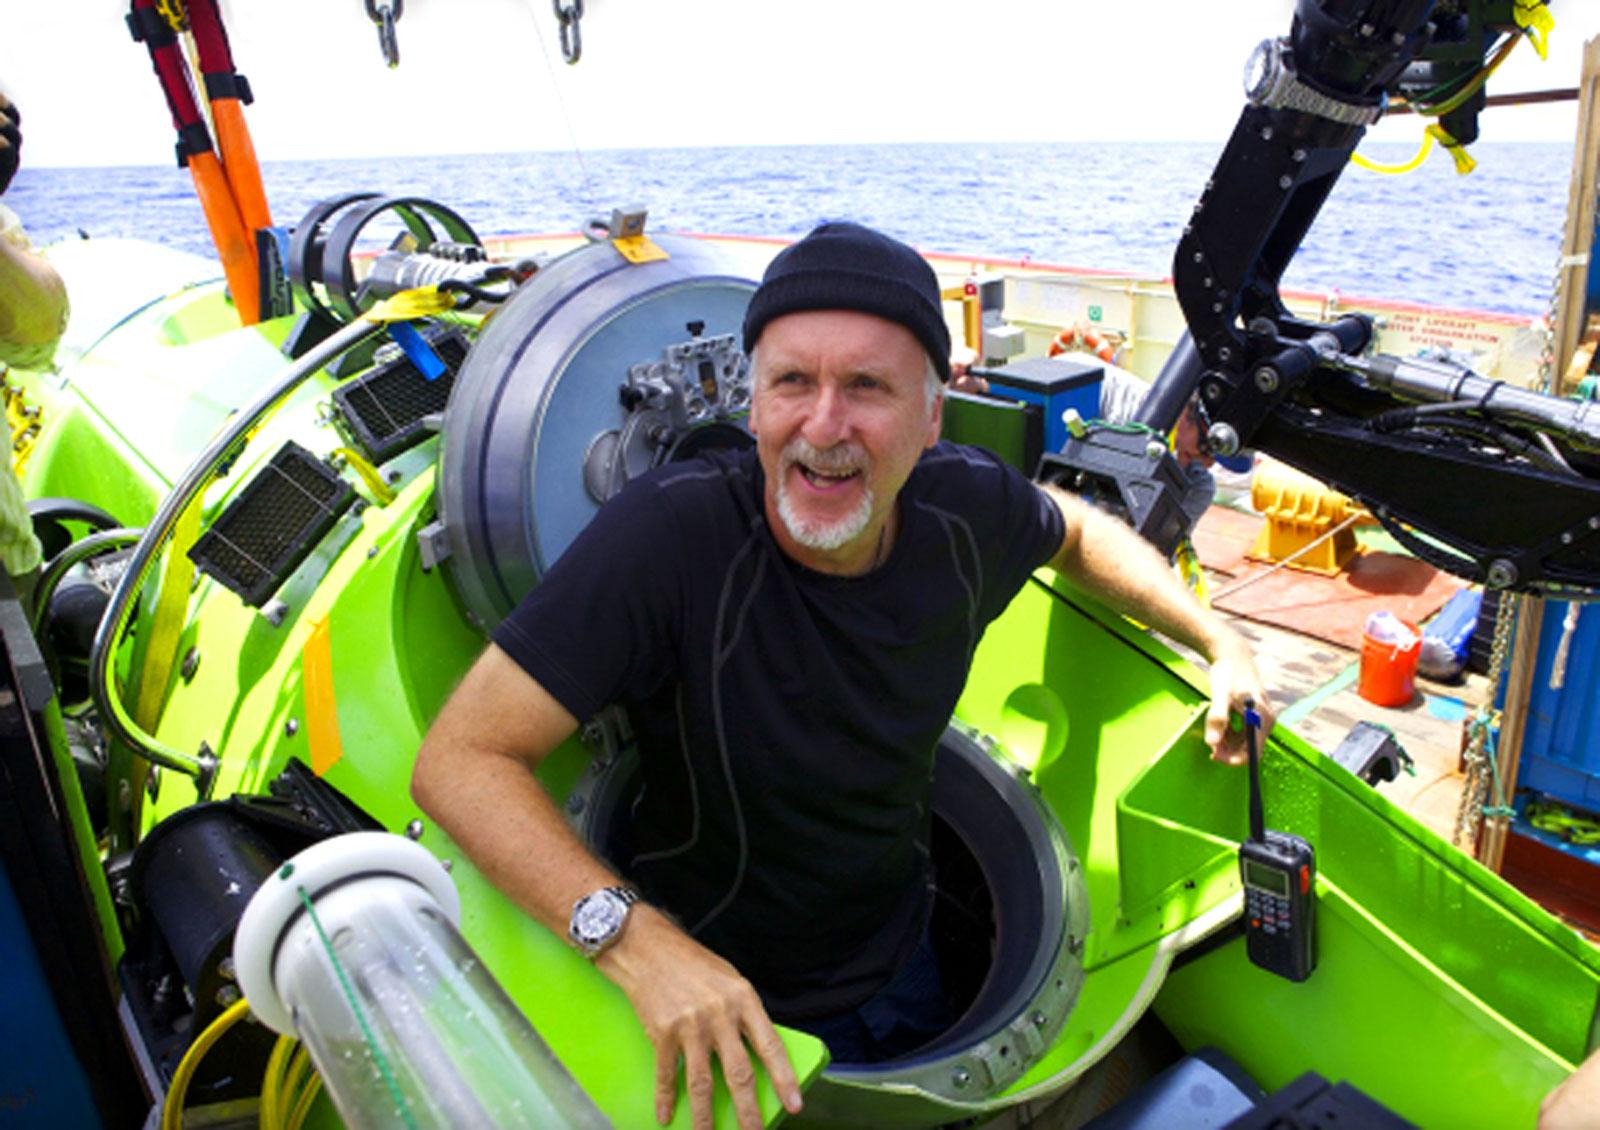 James-Cameron-after-successful-dive-with-Rolex-DEEPSEA-CHALLENGE-on-Robotic-Arm-1lehi6l